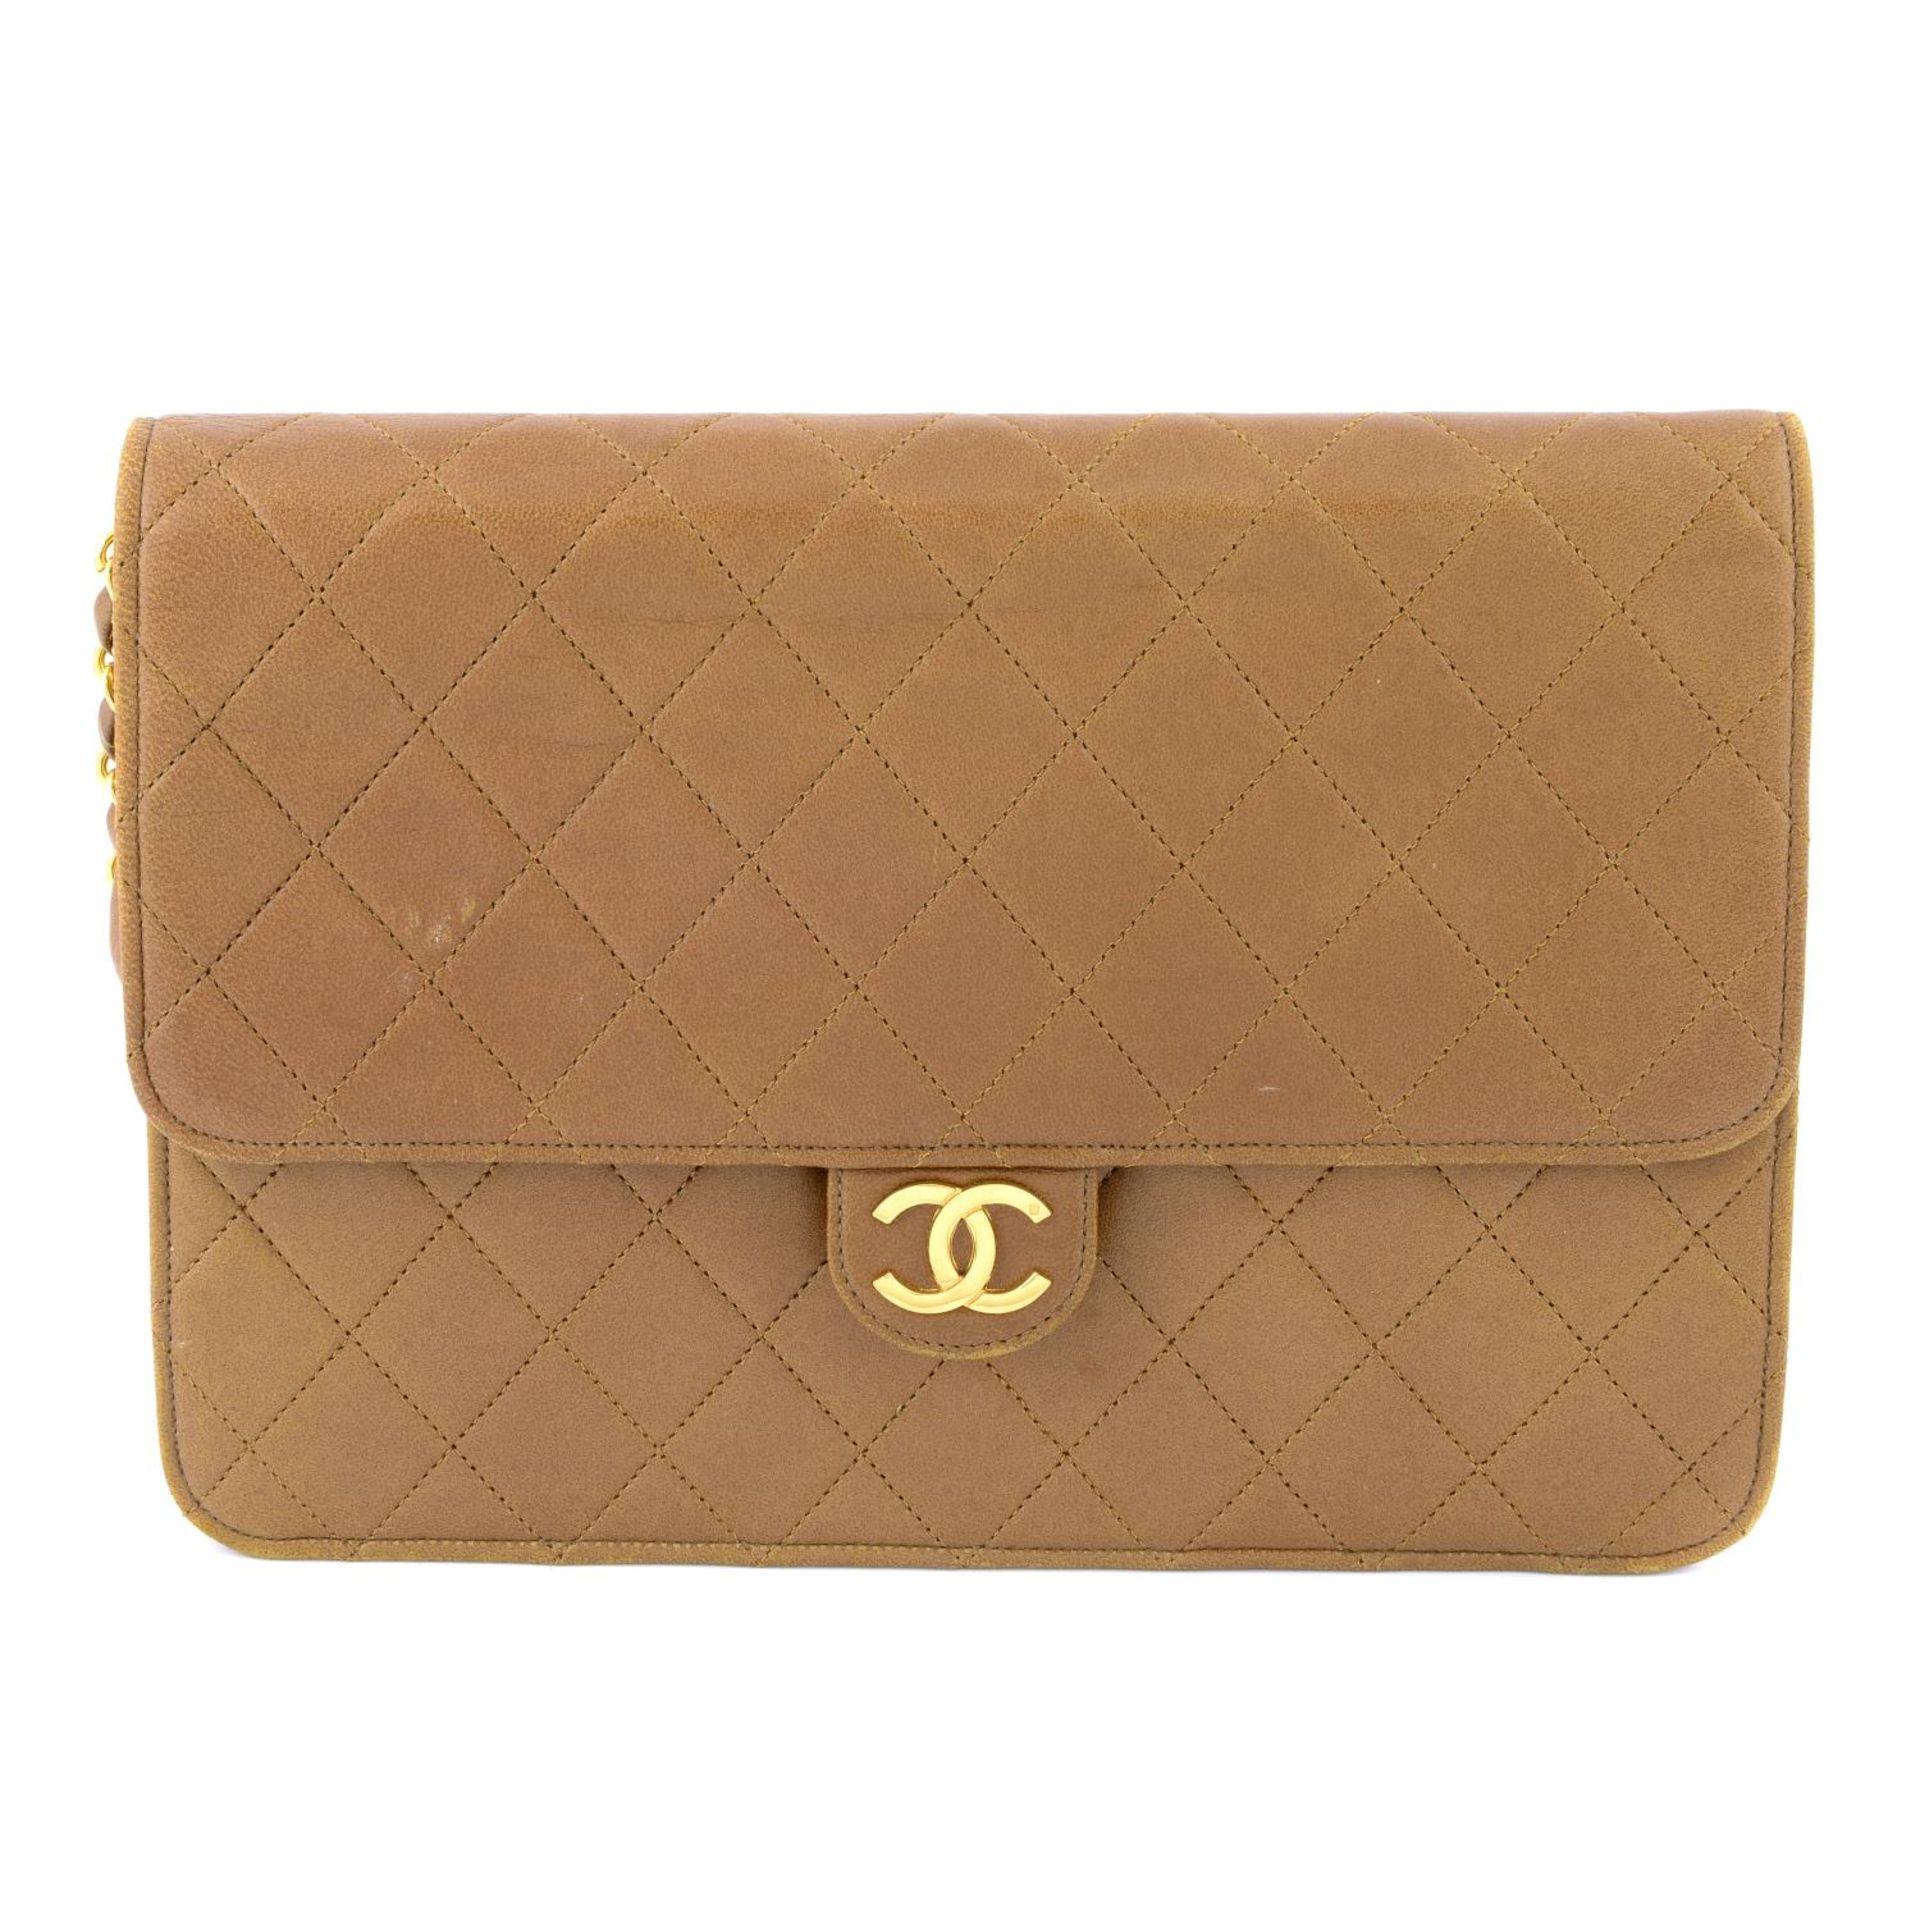 CHANEL - a vintage tan single flap handbag.